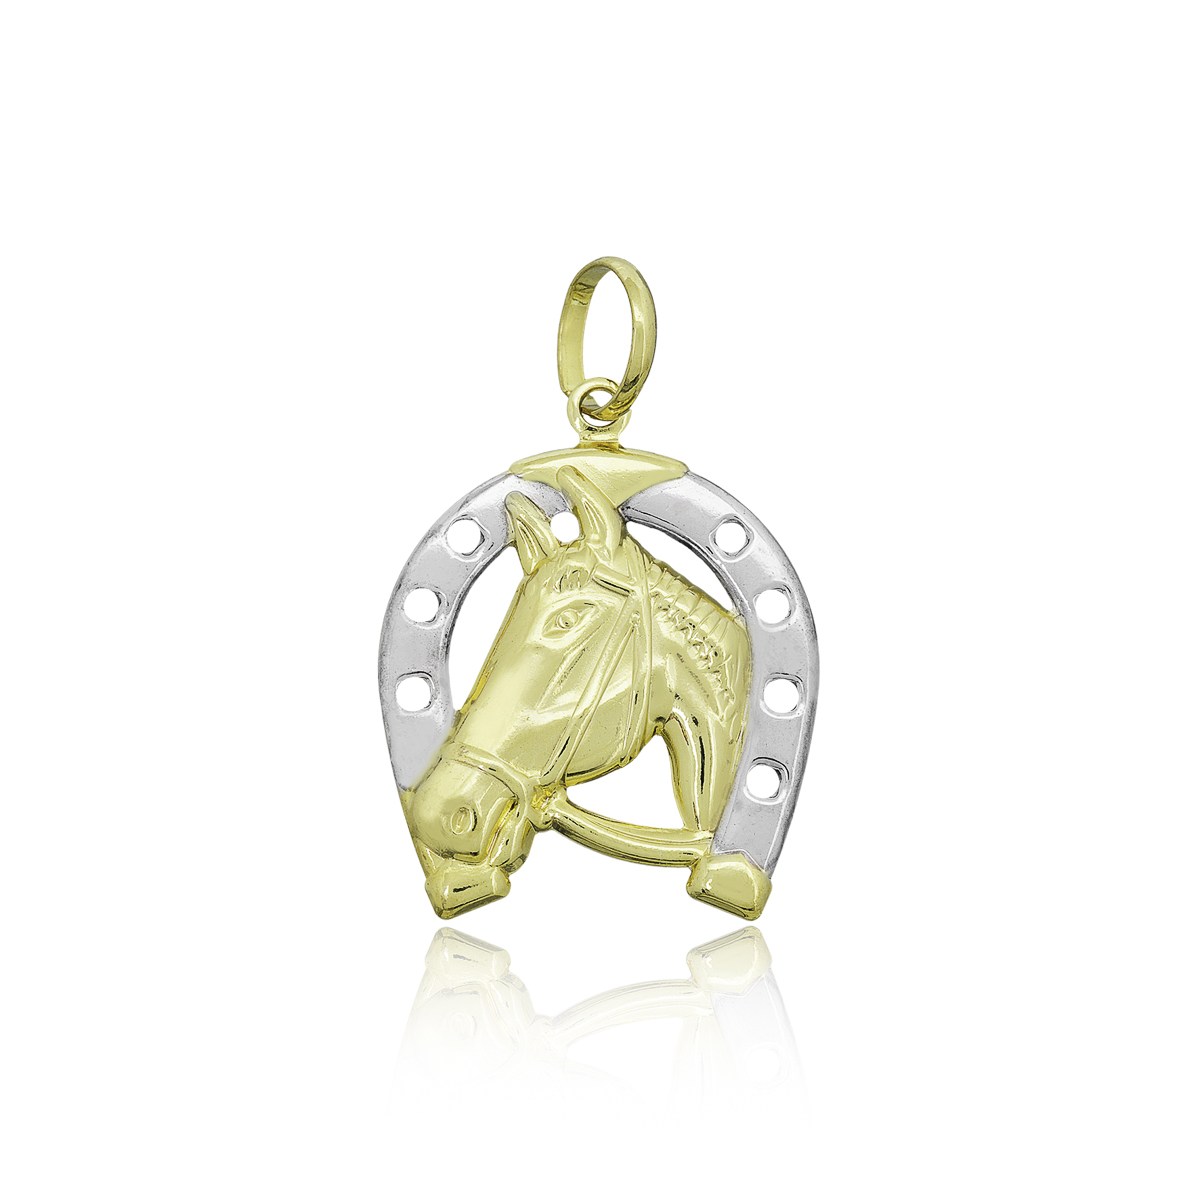 Pingente semijoia Cavalo na ferradura folheado a ouro 18k